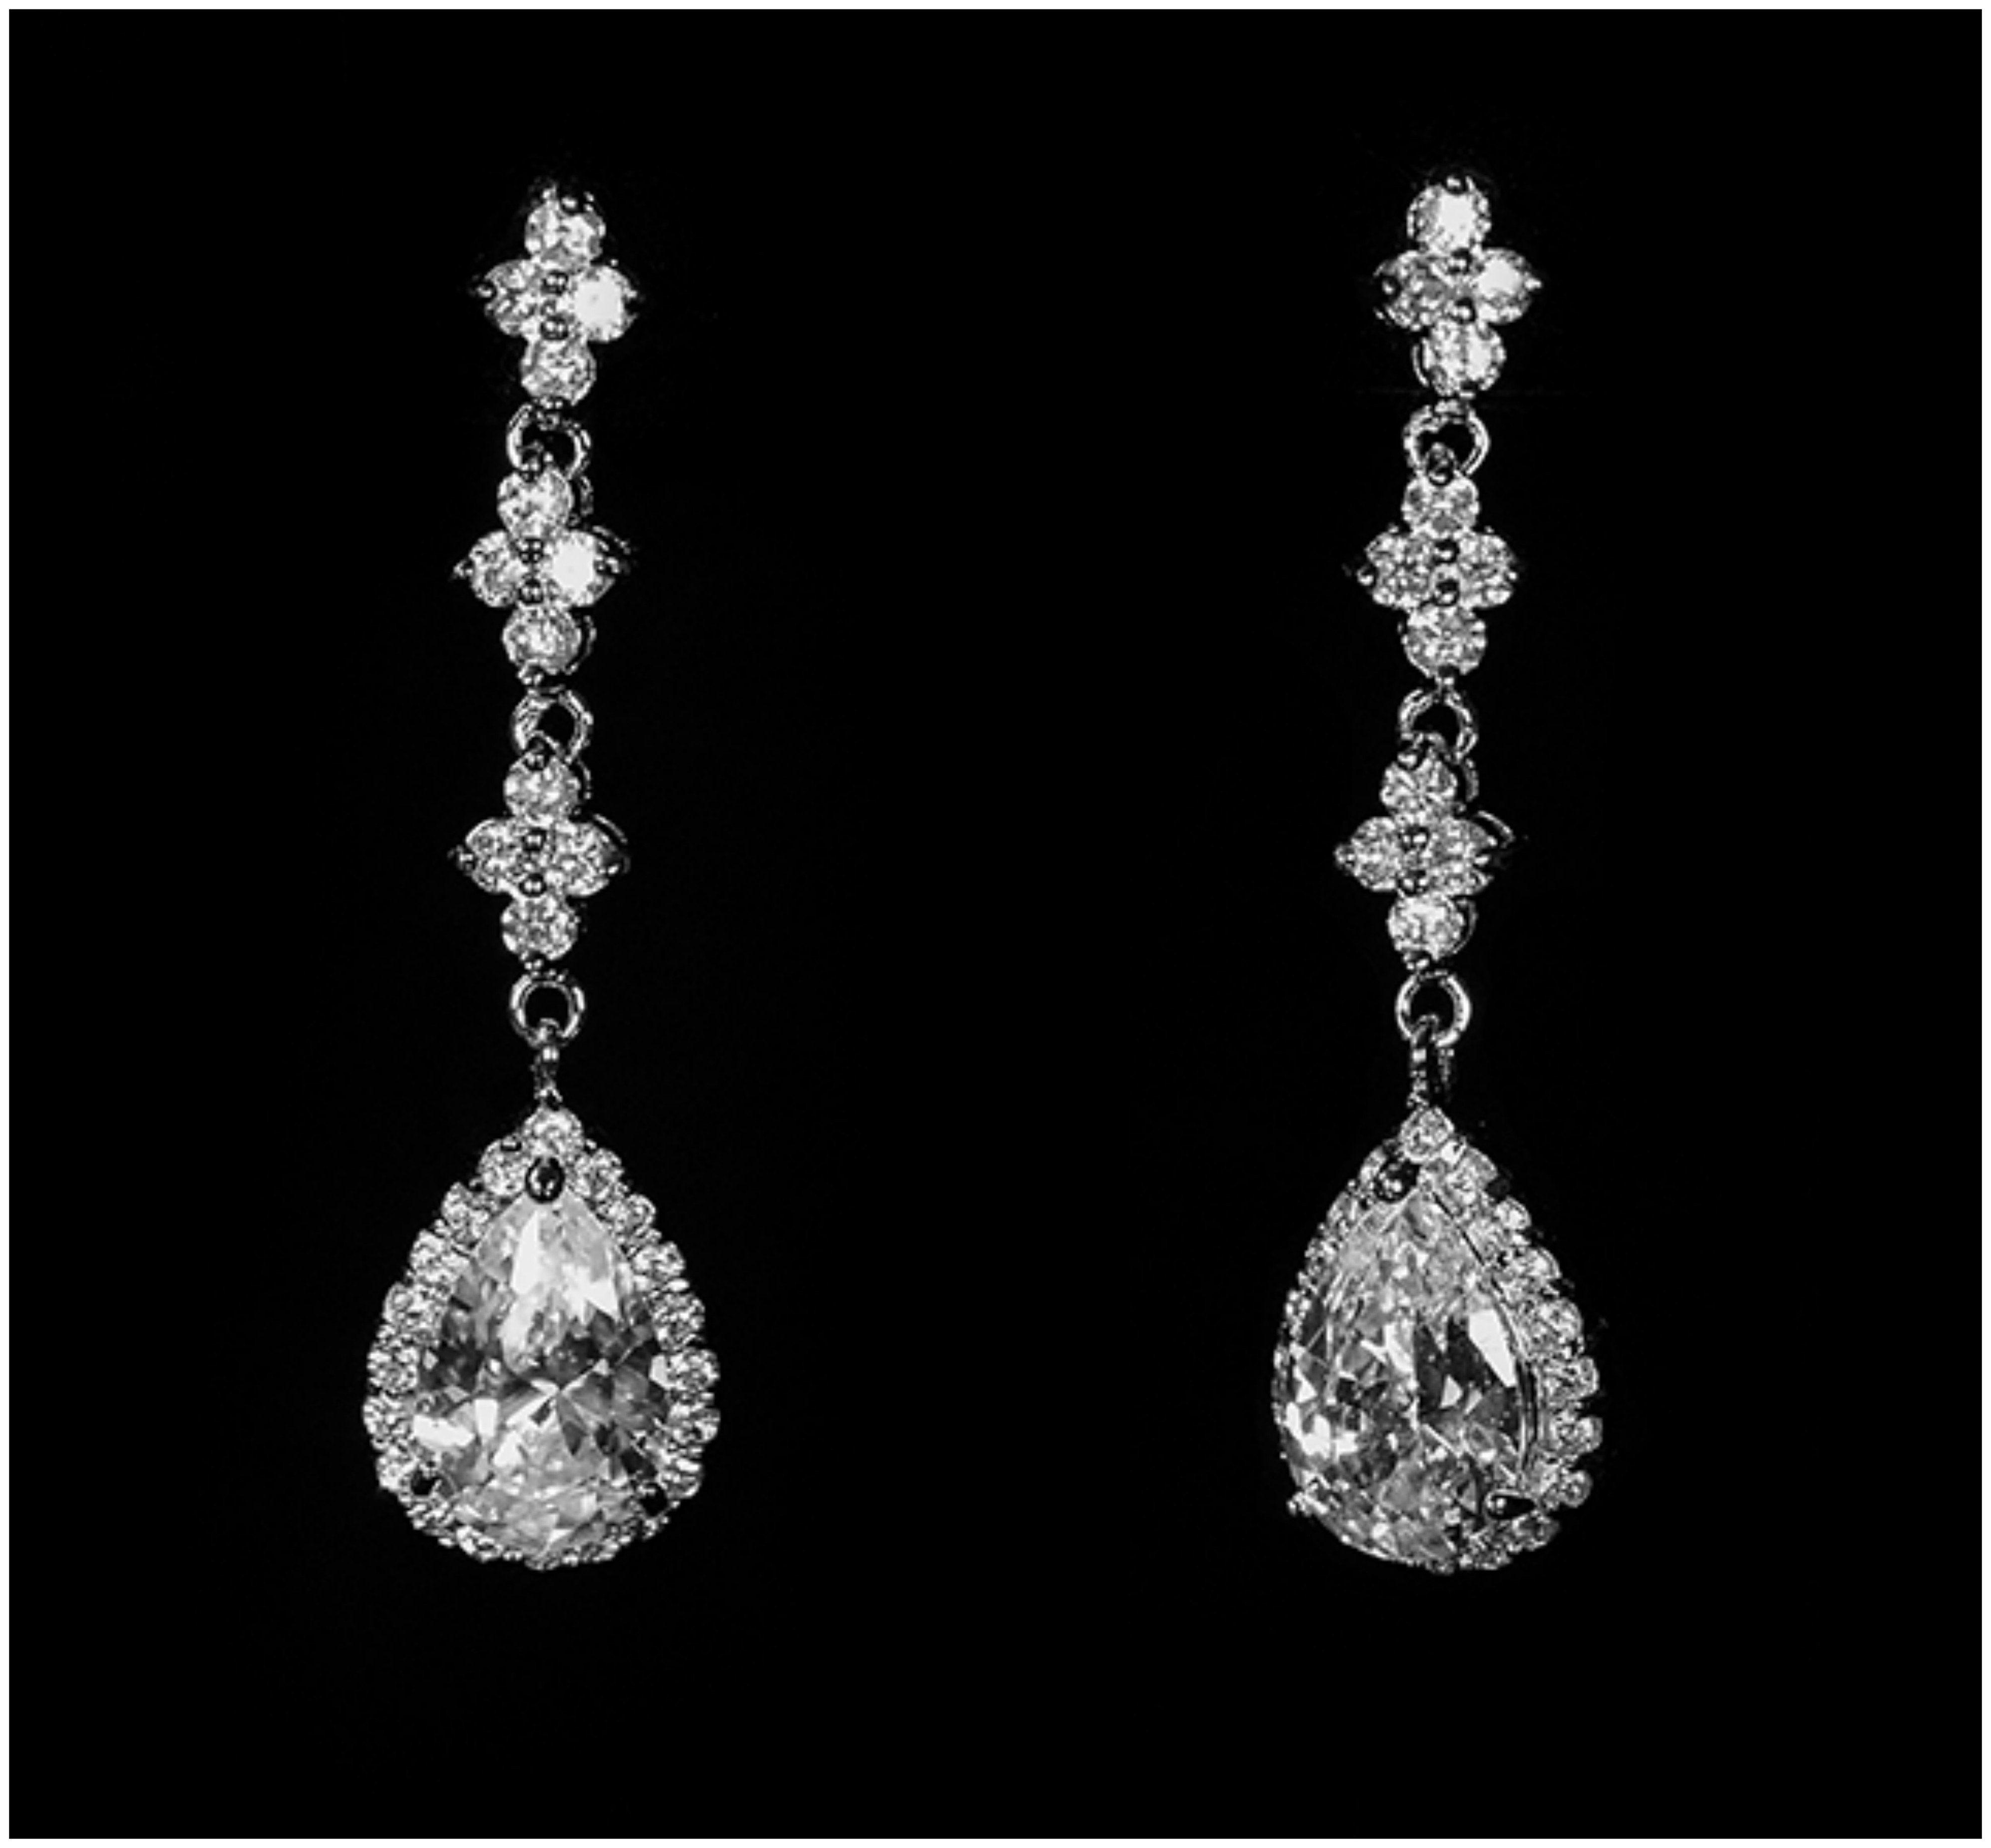 Fiala romantic pear drop halo earrings 6ct cubic zirconia fiala romantic pear drop halo earrings 6ct cubic zirconia silver arubaitofo Choice Image